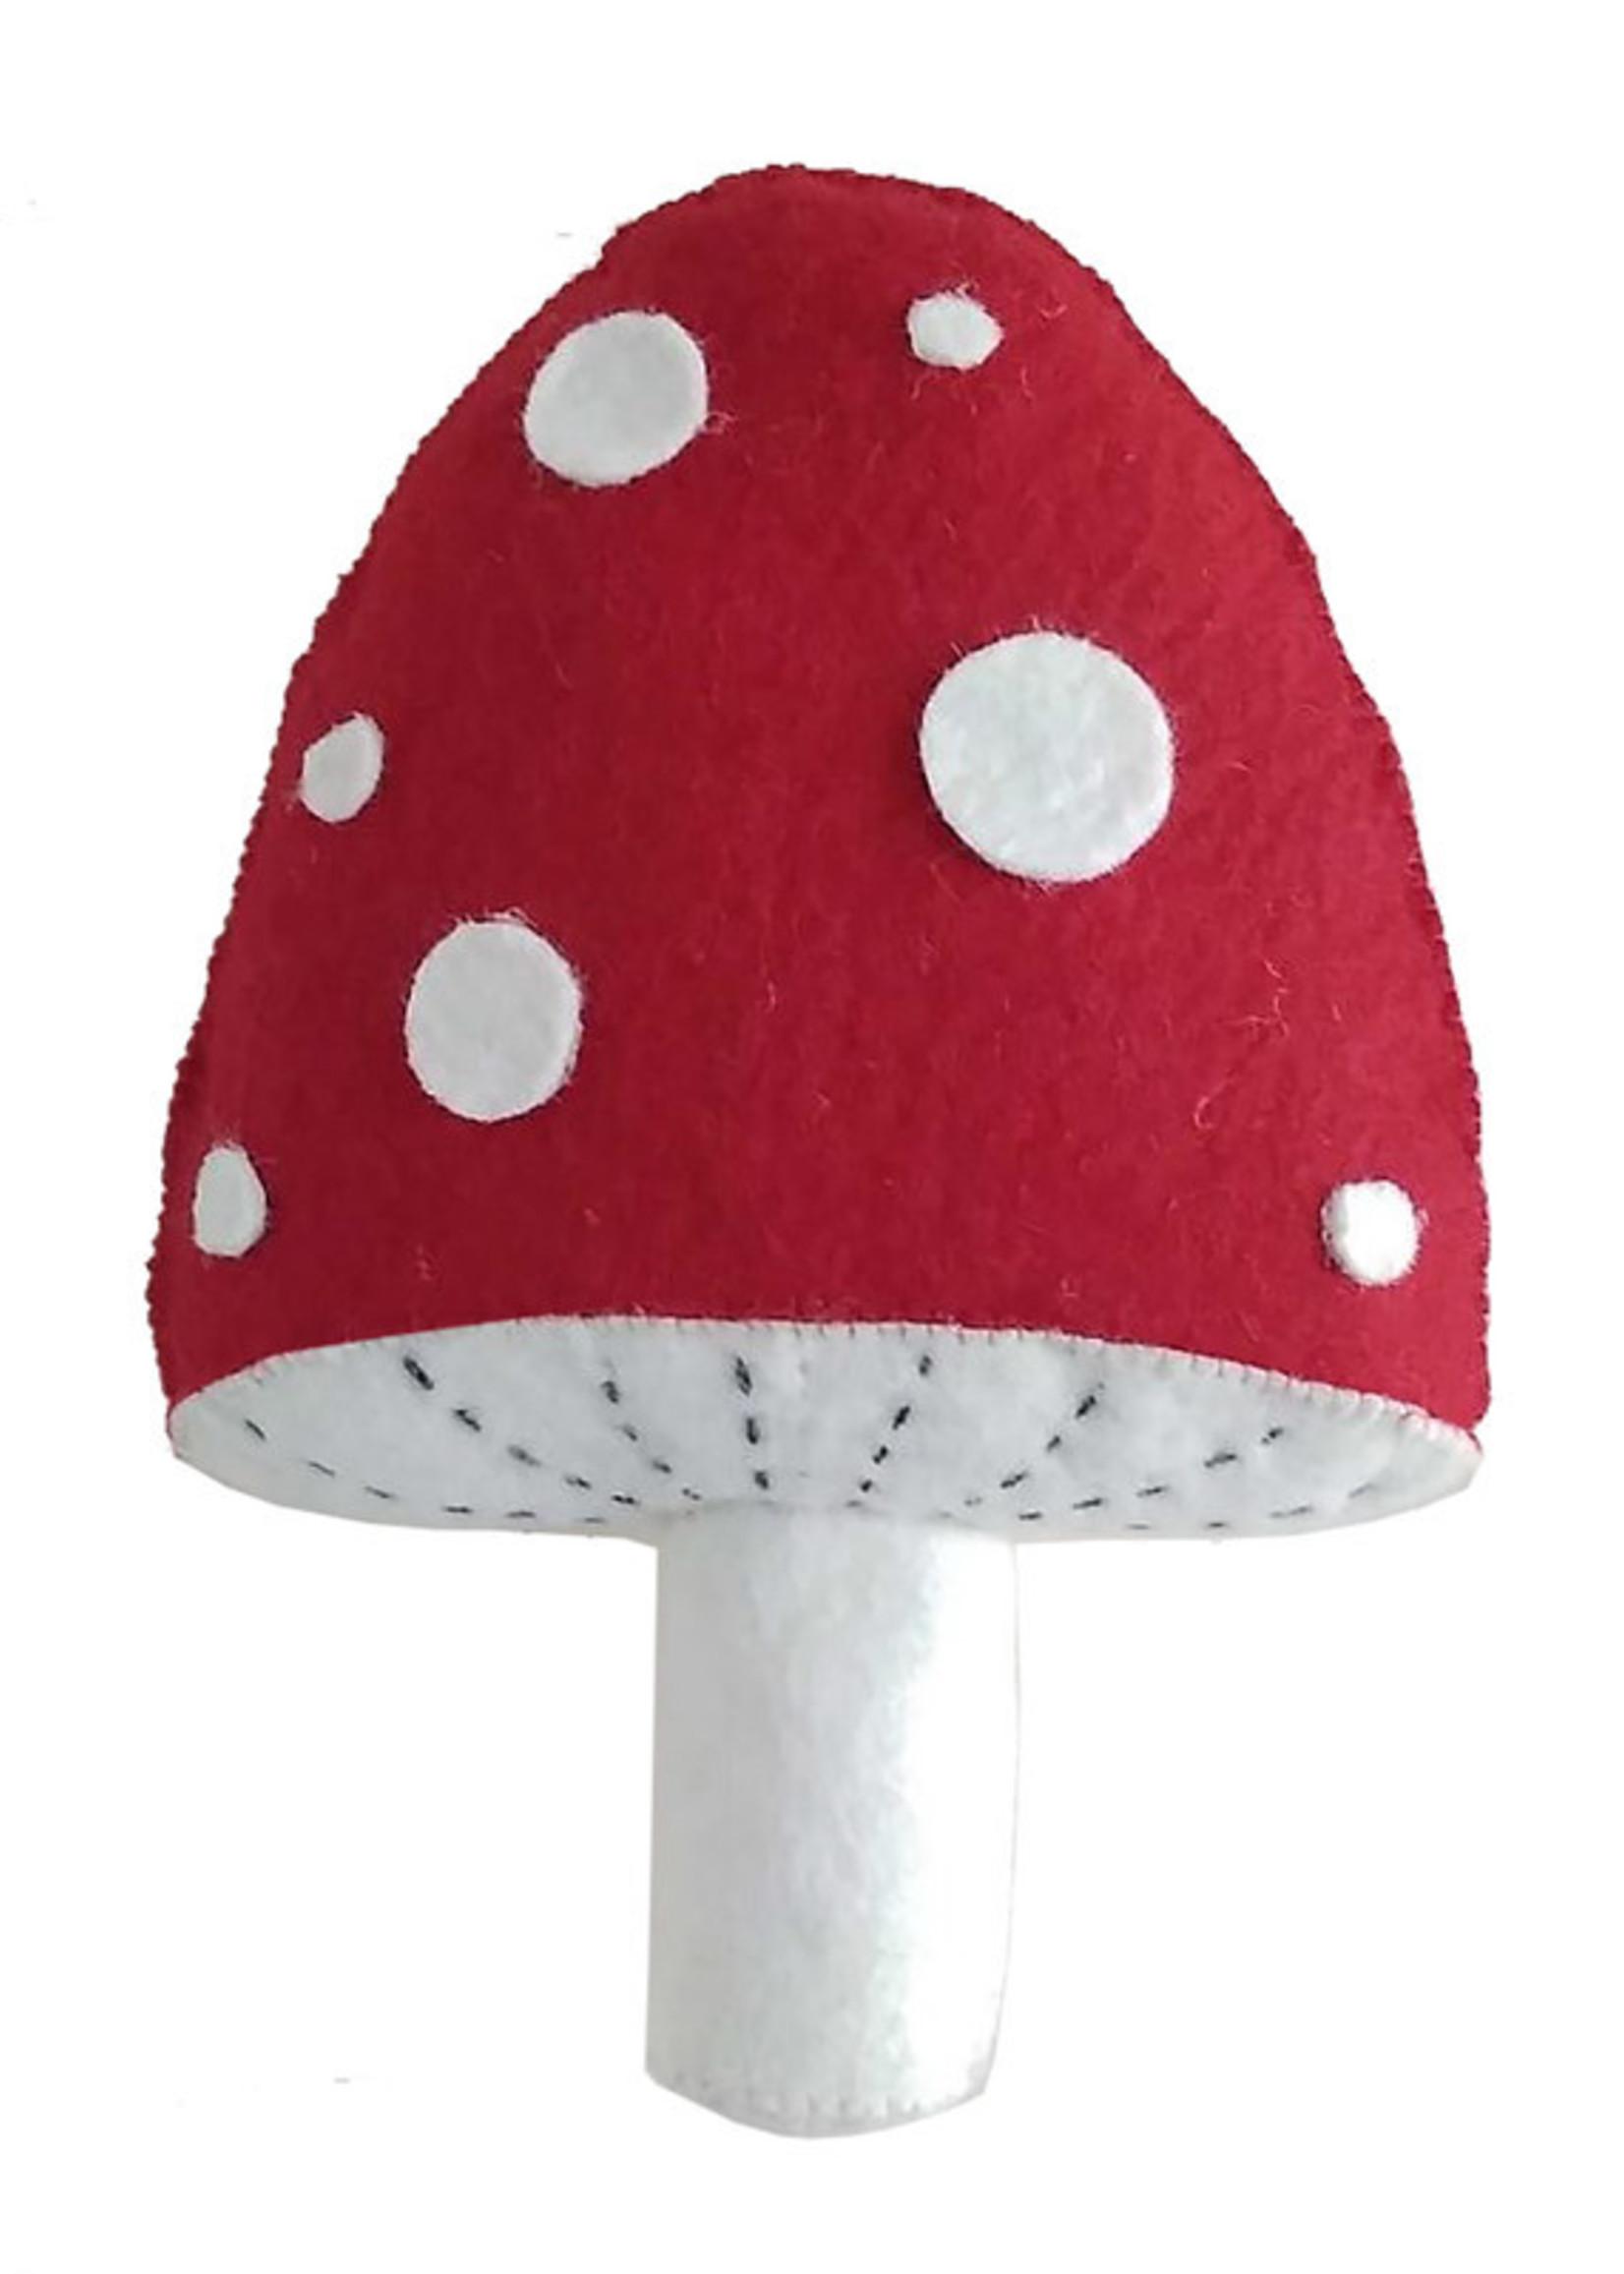 fiona walker england Mini Red Mushroom Wall Hangin